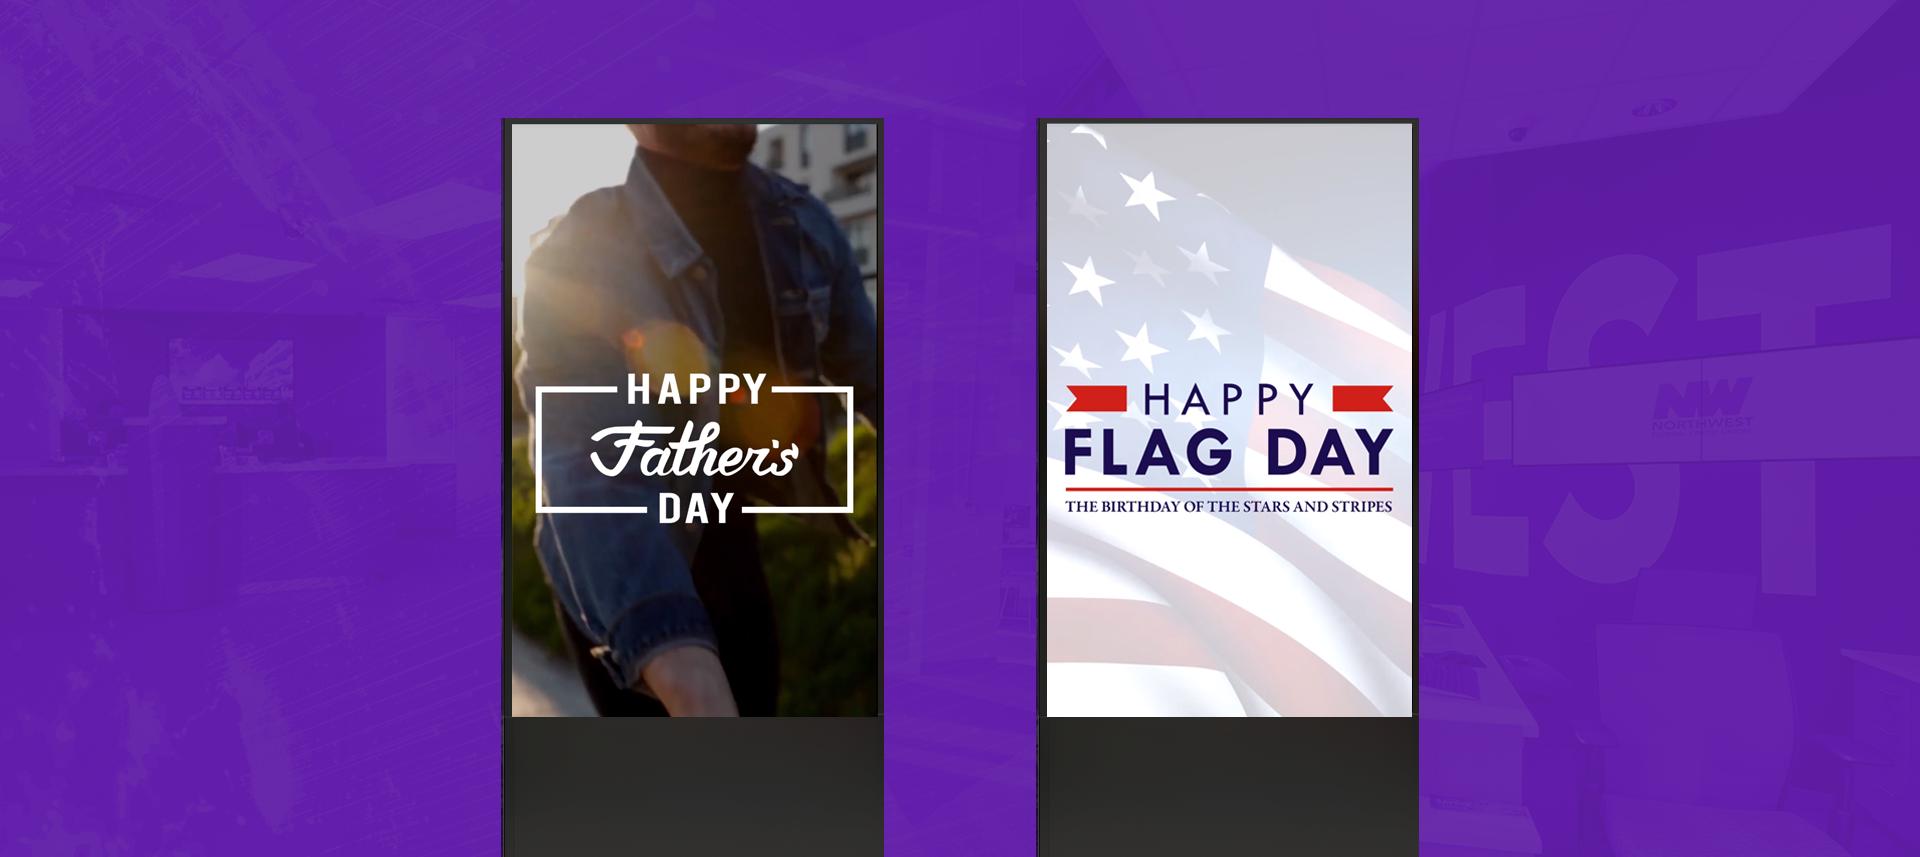 Free Digital Signage Content: June Holidays